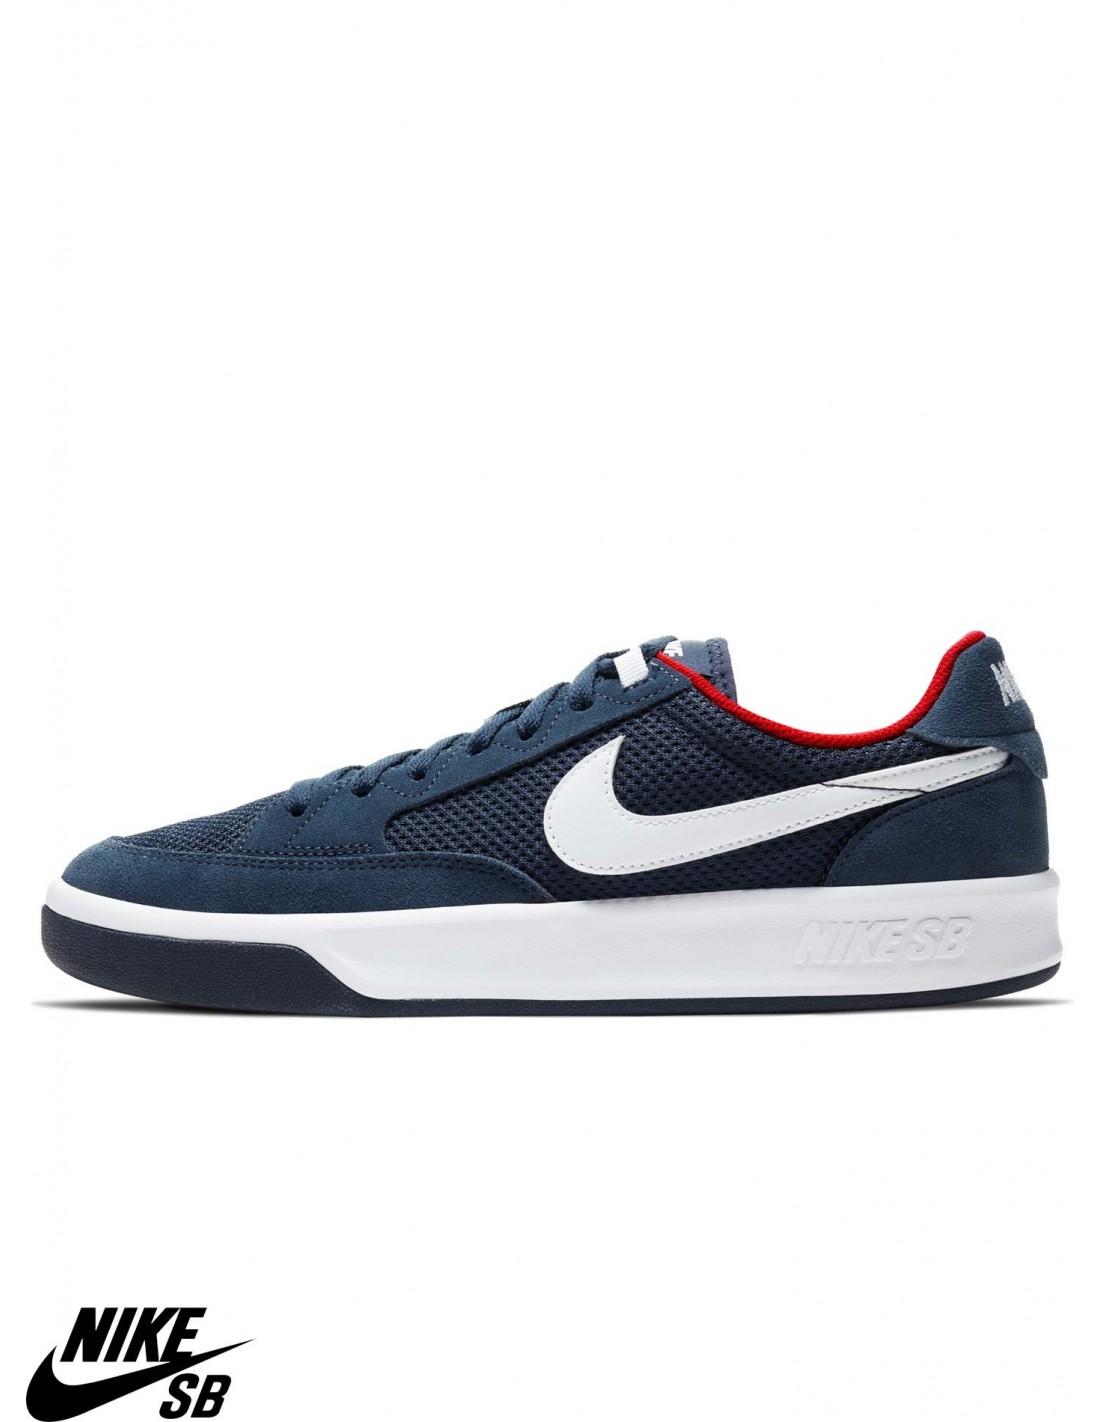 Chaussures Skate Nike SB Adversary Midnight Navy